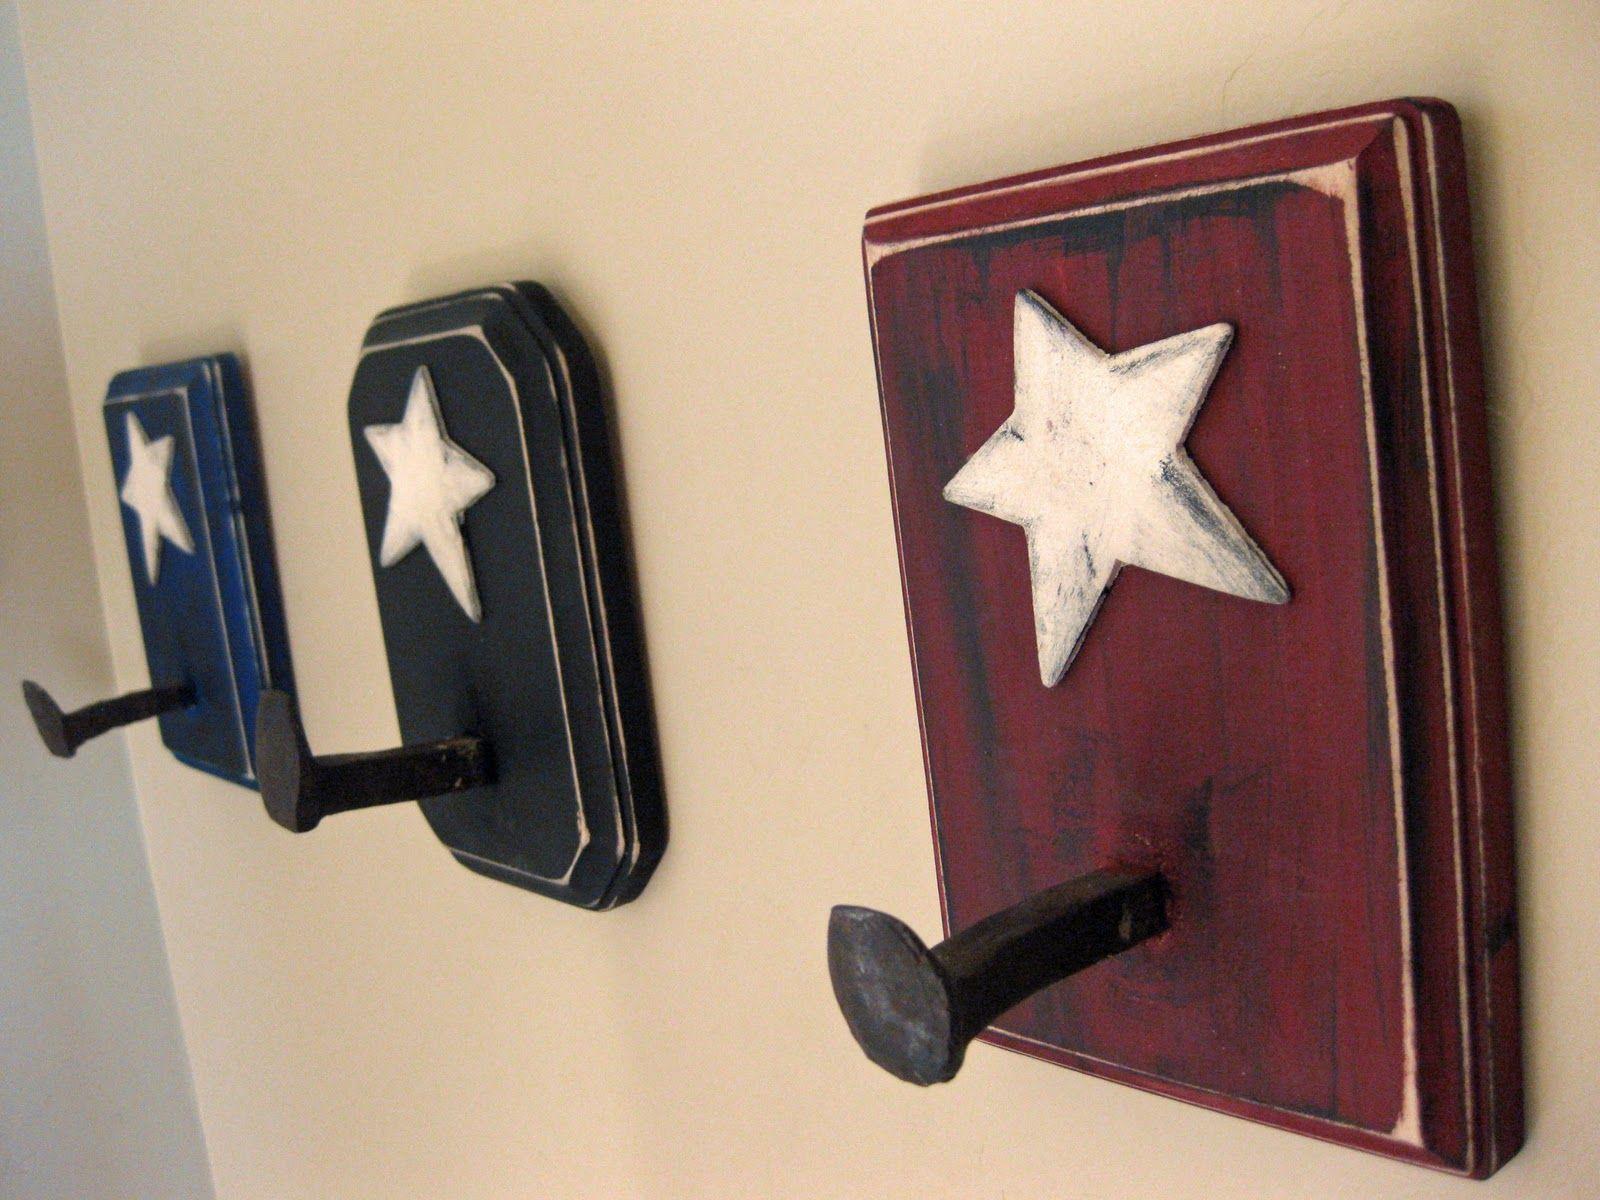 Military Themed Room Patriotic Bedroom Railroad Spikes Crafts American Flag Decor American flag bathroom decor